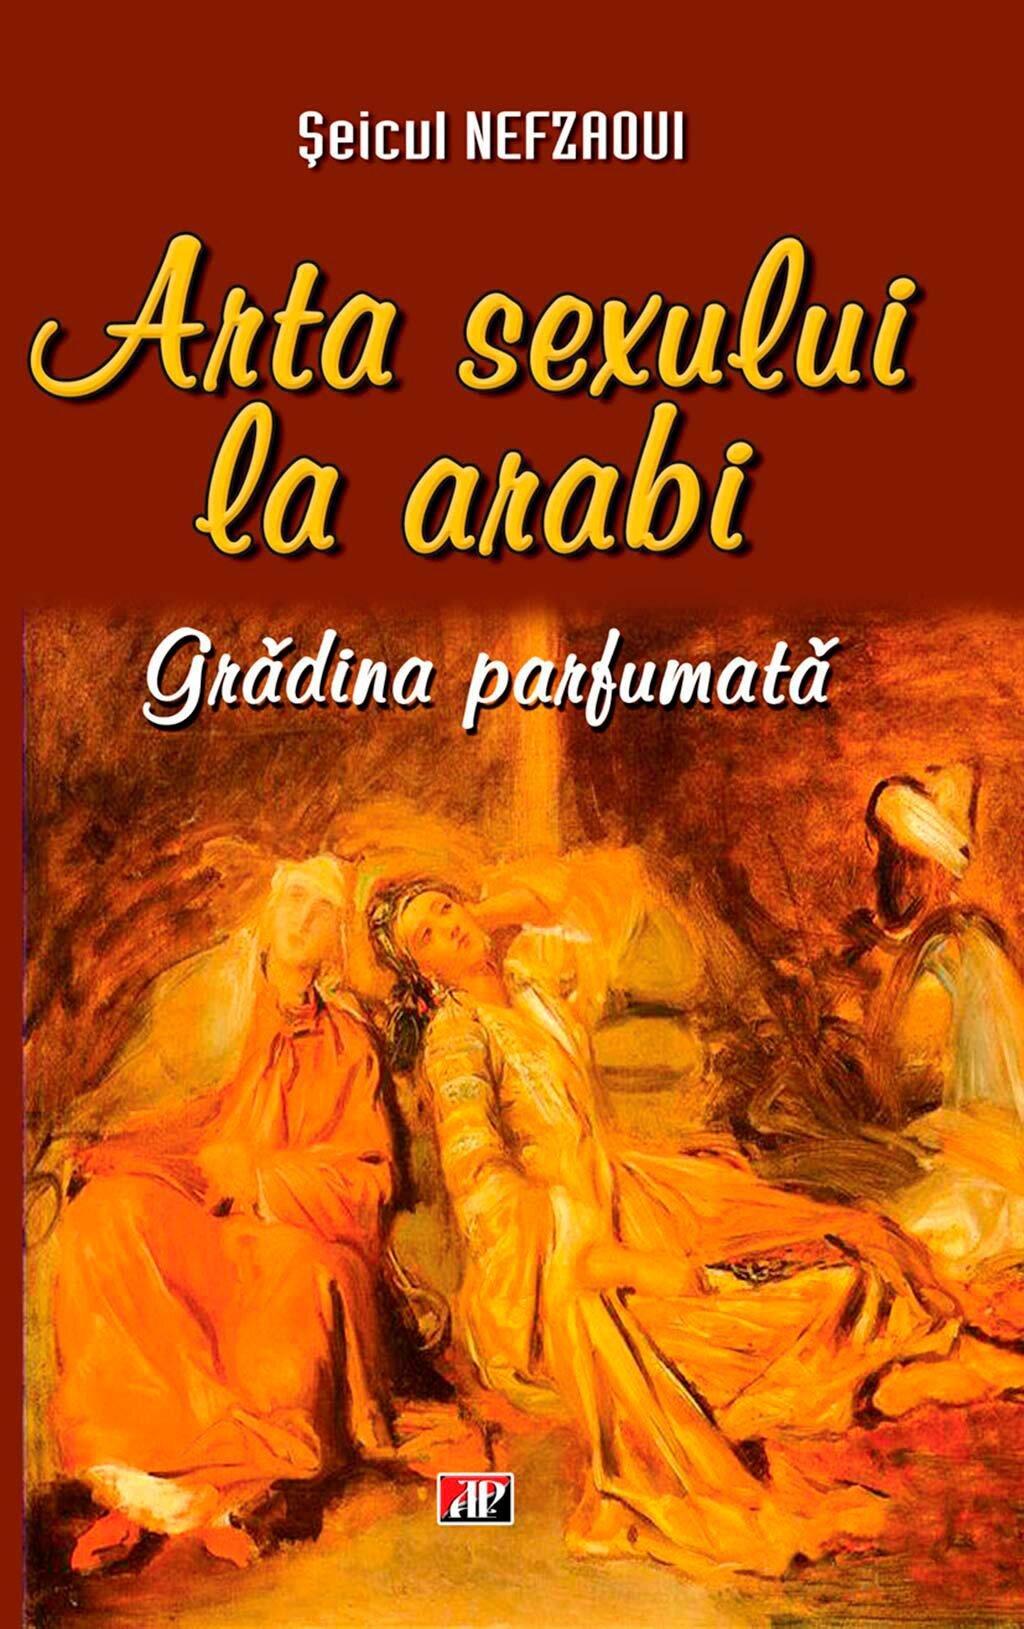 Arta sexului la arabi. Gradina parfumata (eBook)